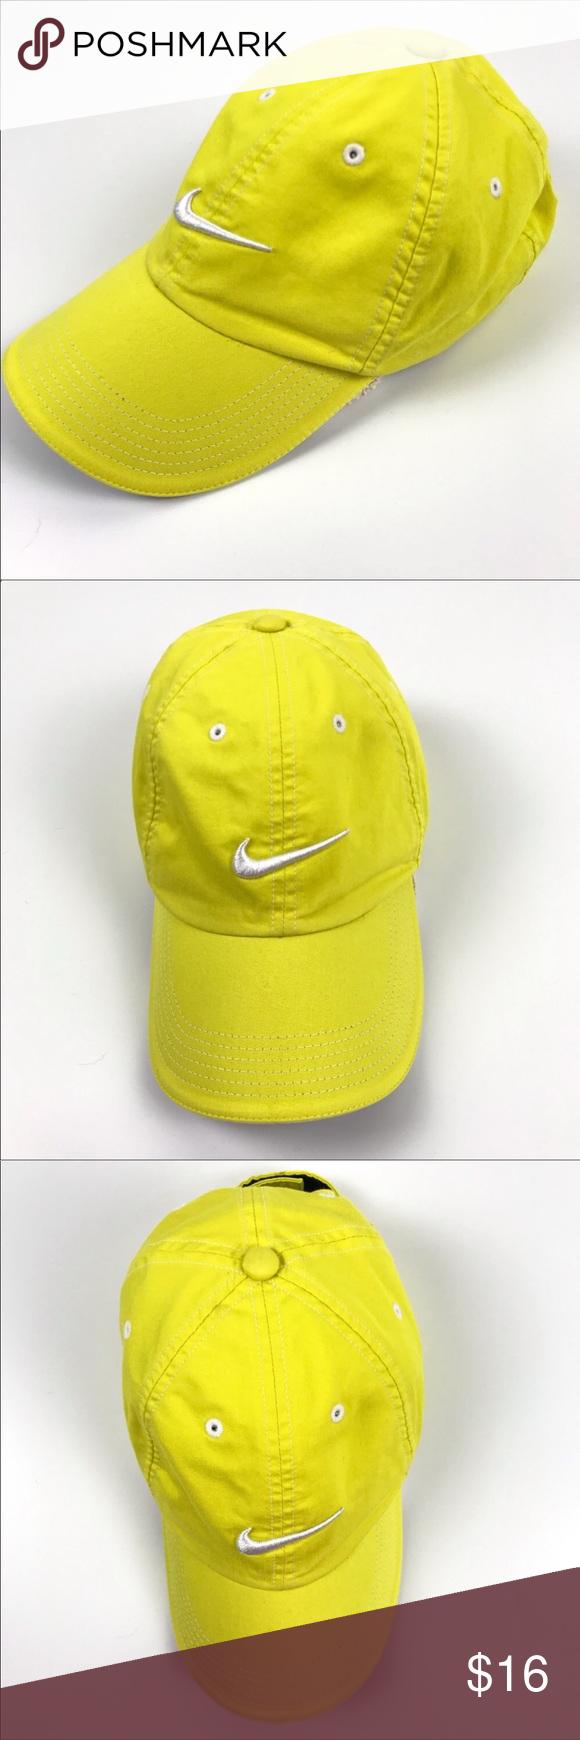 Nike Golf Hat Baseball Cap Adjustable Yellow Os Nike Golf Hat Baseball Hats Nike Golf